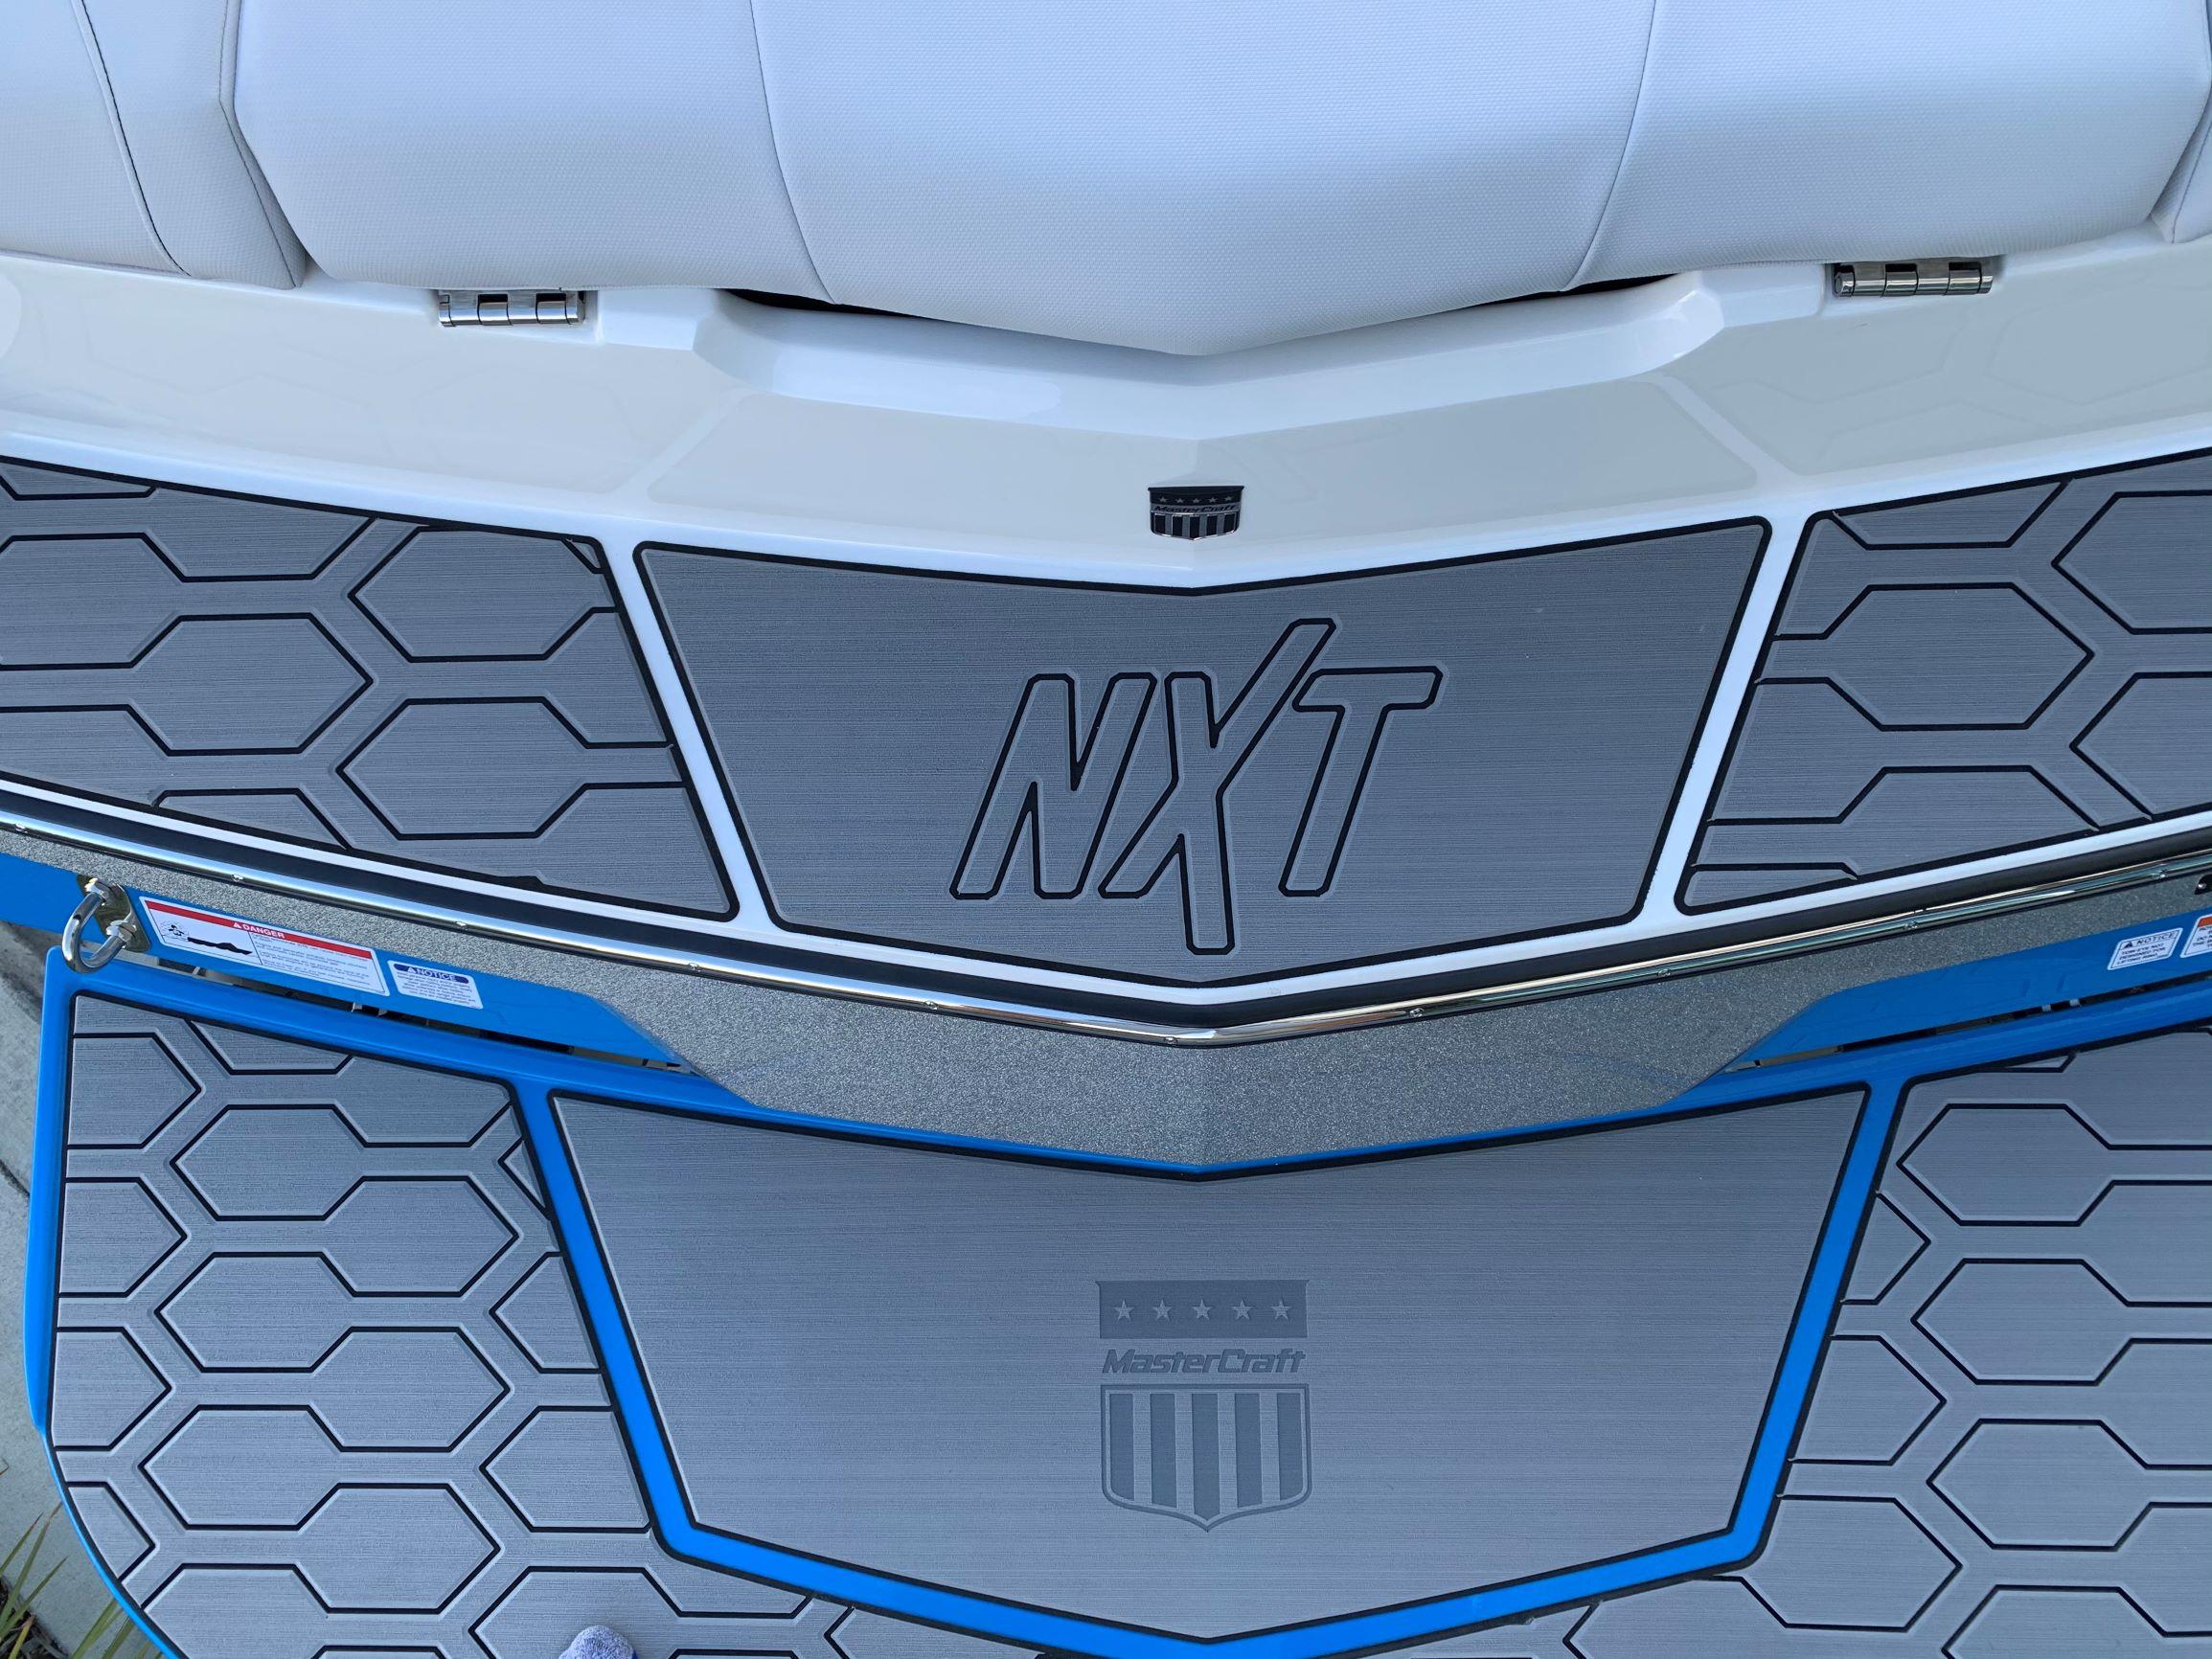 2020 MasterCraft NXT22 -  Image 13